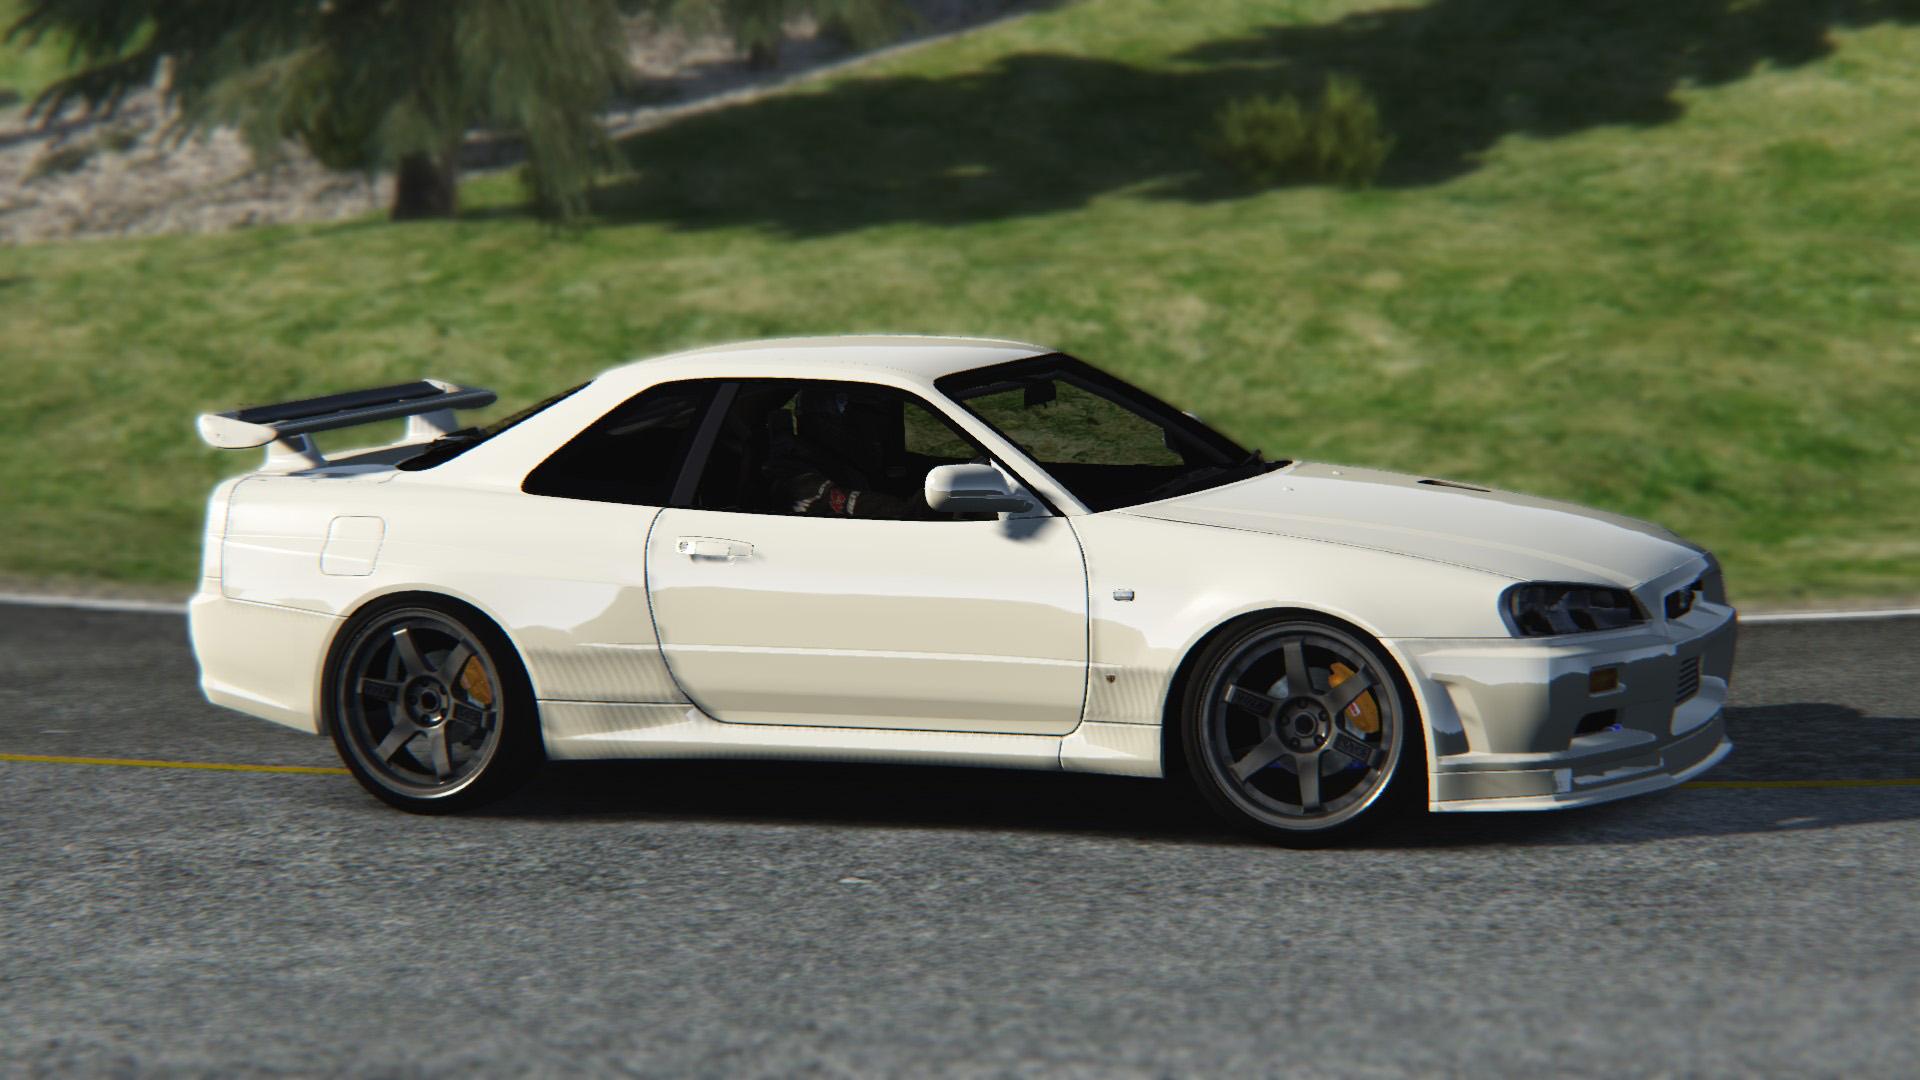 List Of Cars >> Nissan Skyline R34 Drift - Nissan - Car Detail - Assetto ...